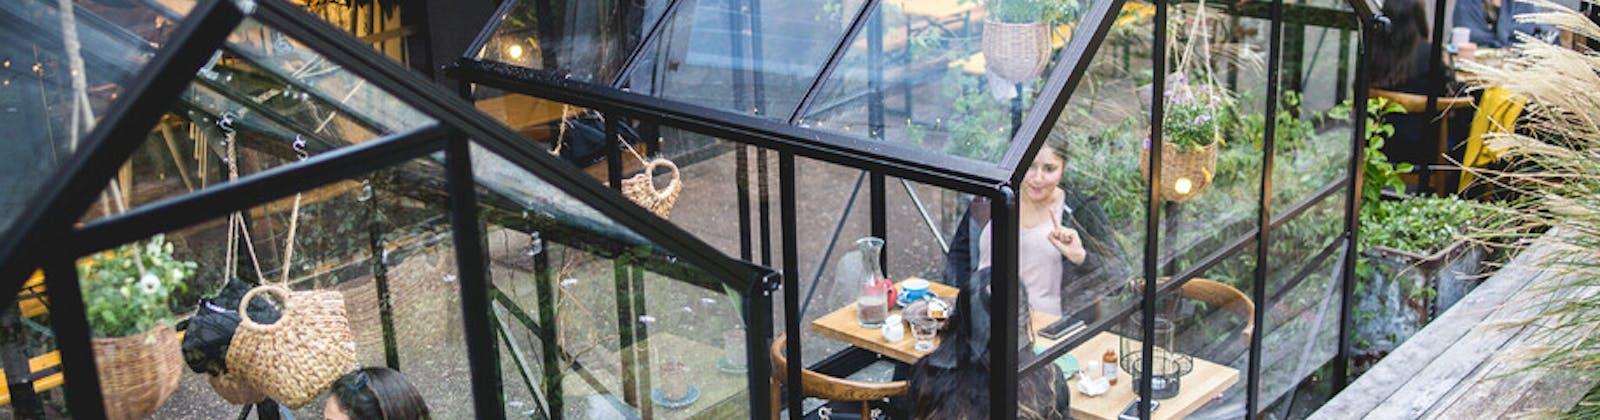 Miann chocolate factory morningside glasshouses